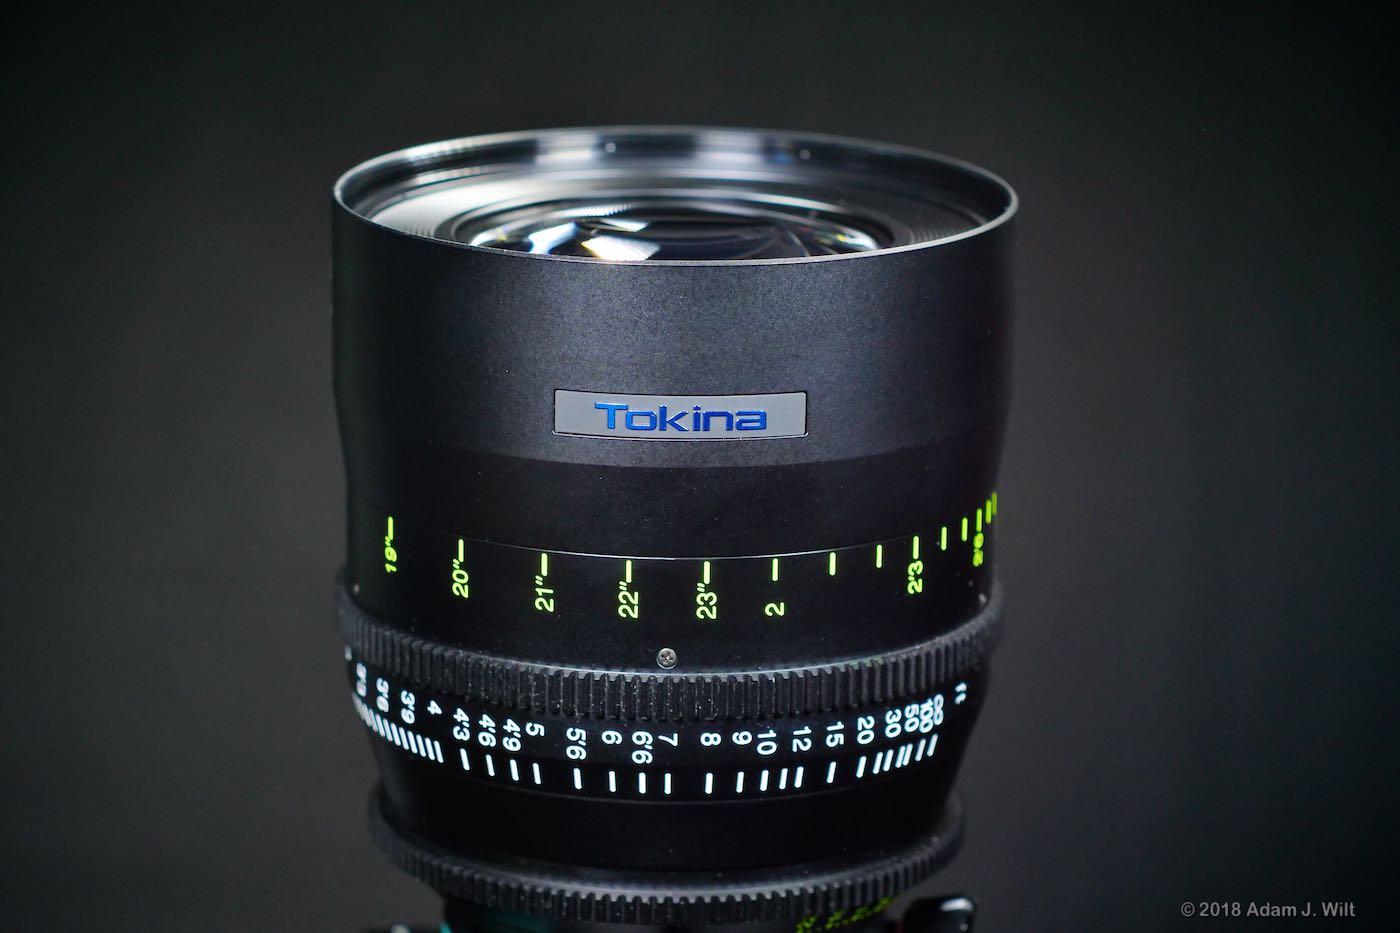 Tokina Vista 50mm T1.5 prime lens